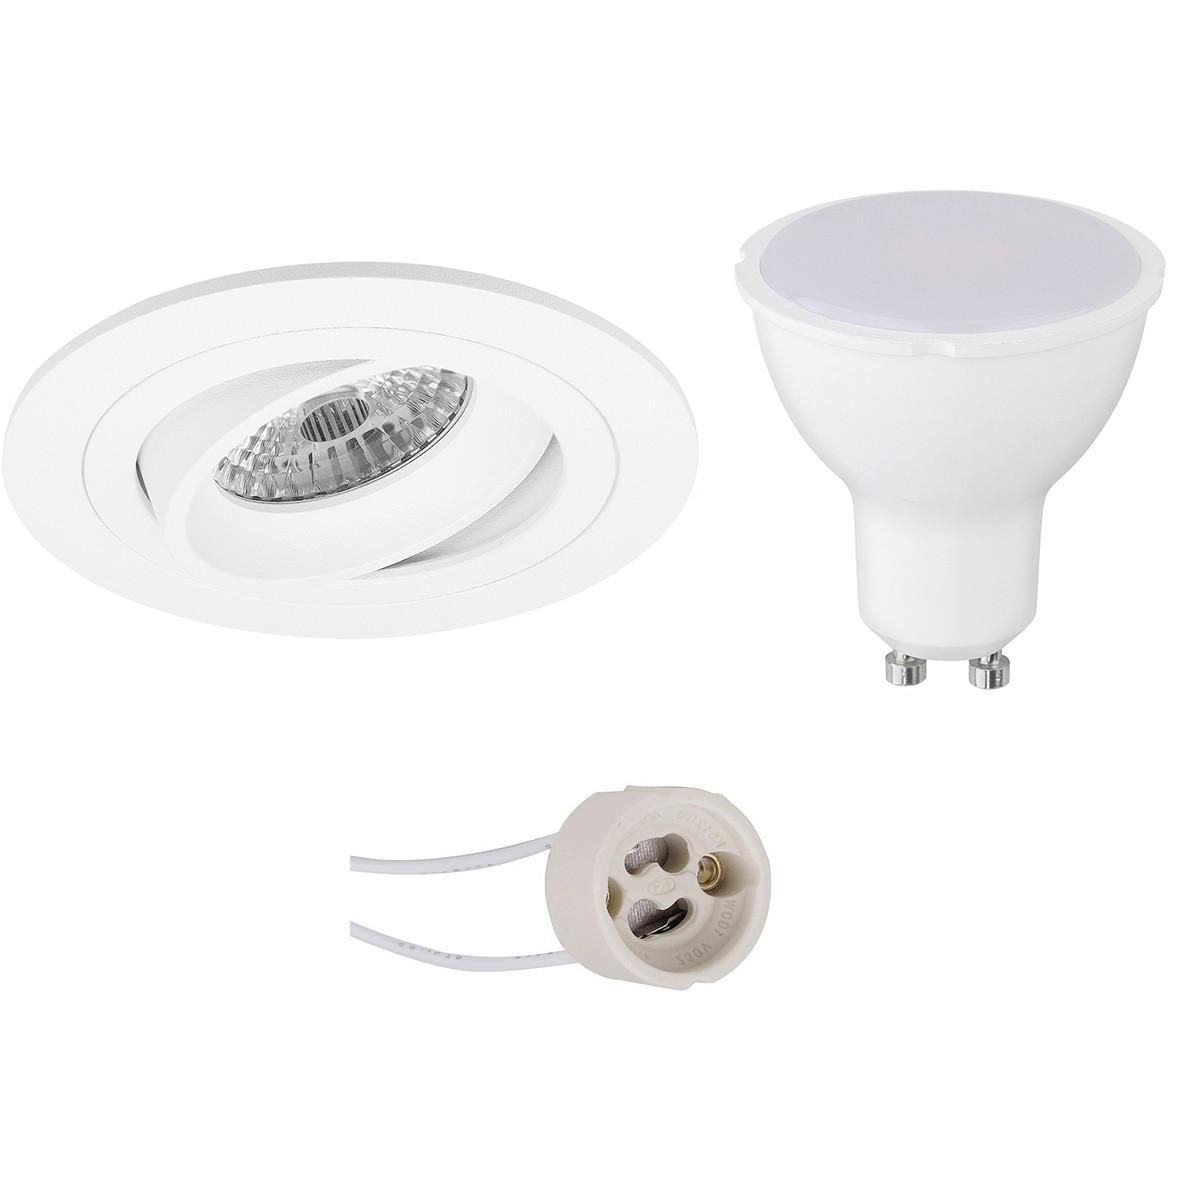 LED Spot Set - Pragmi Alpin Pro - GU10 Fitting - Inbouw Rond - Mat Wit - 8W - Natuurlijk Wit 4200K -